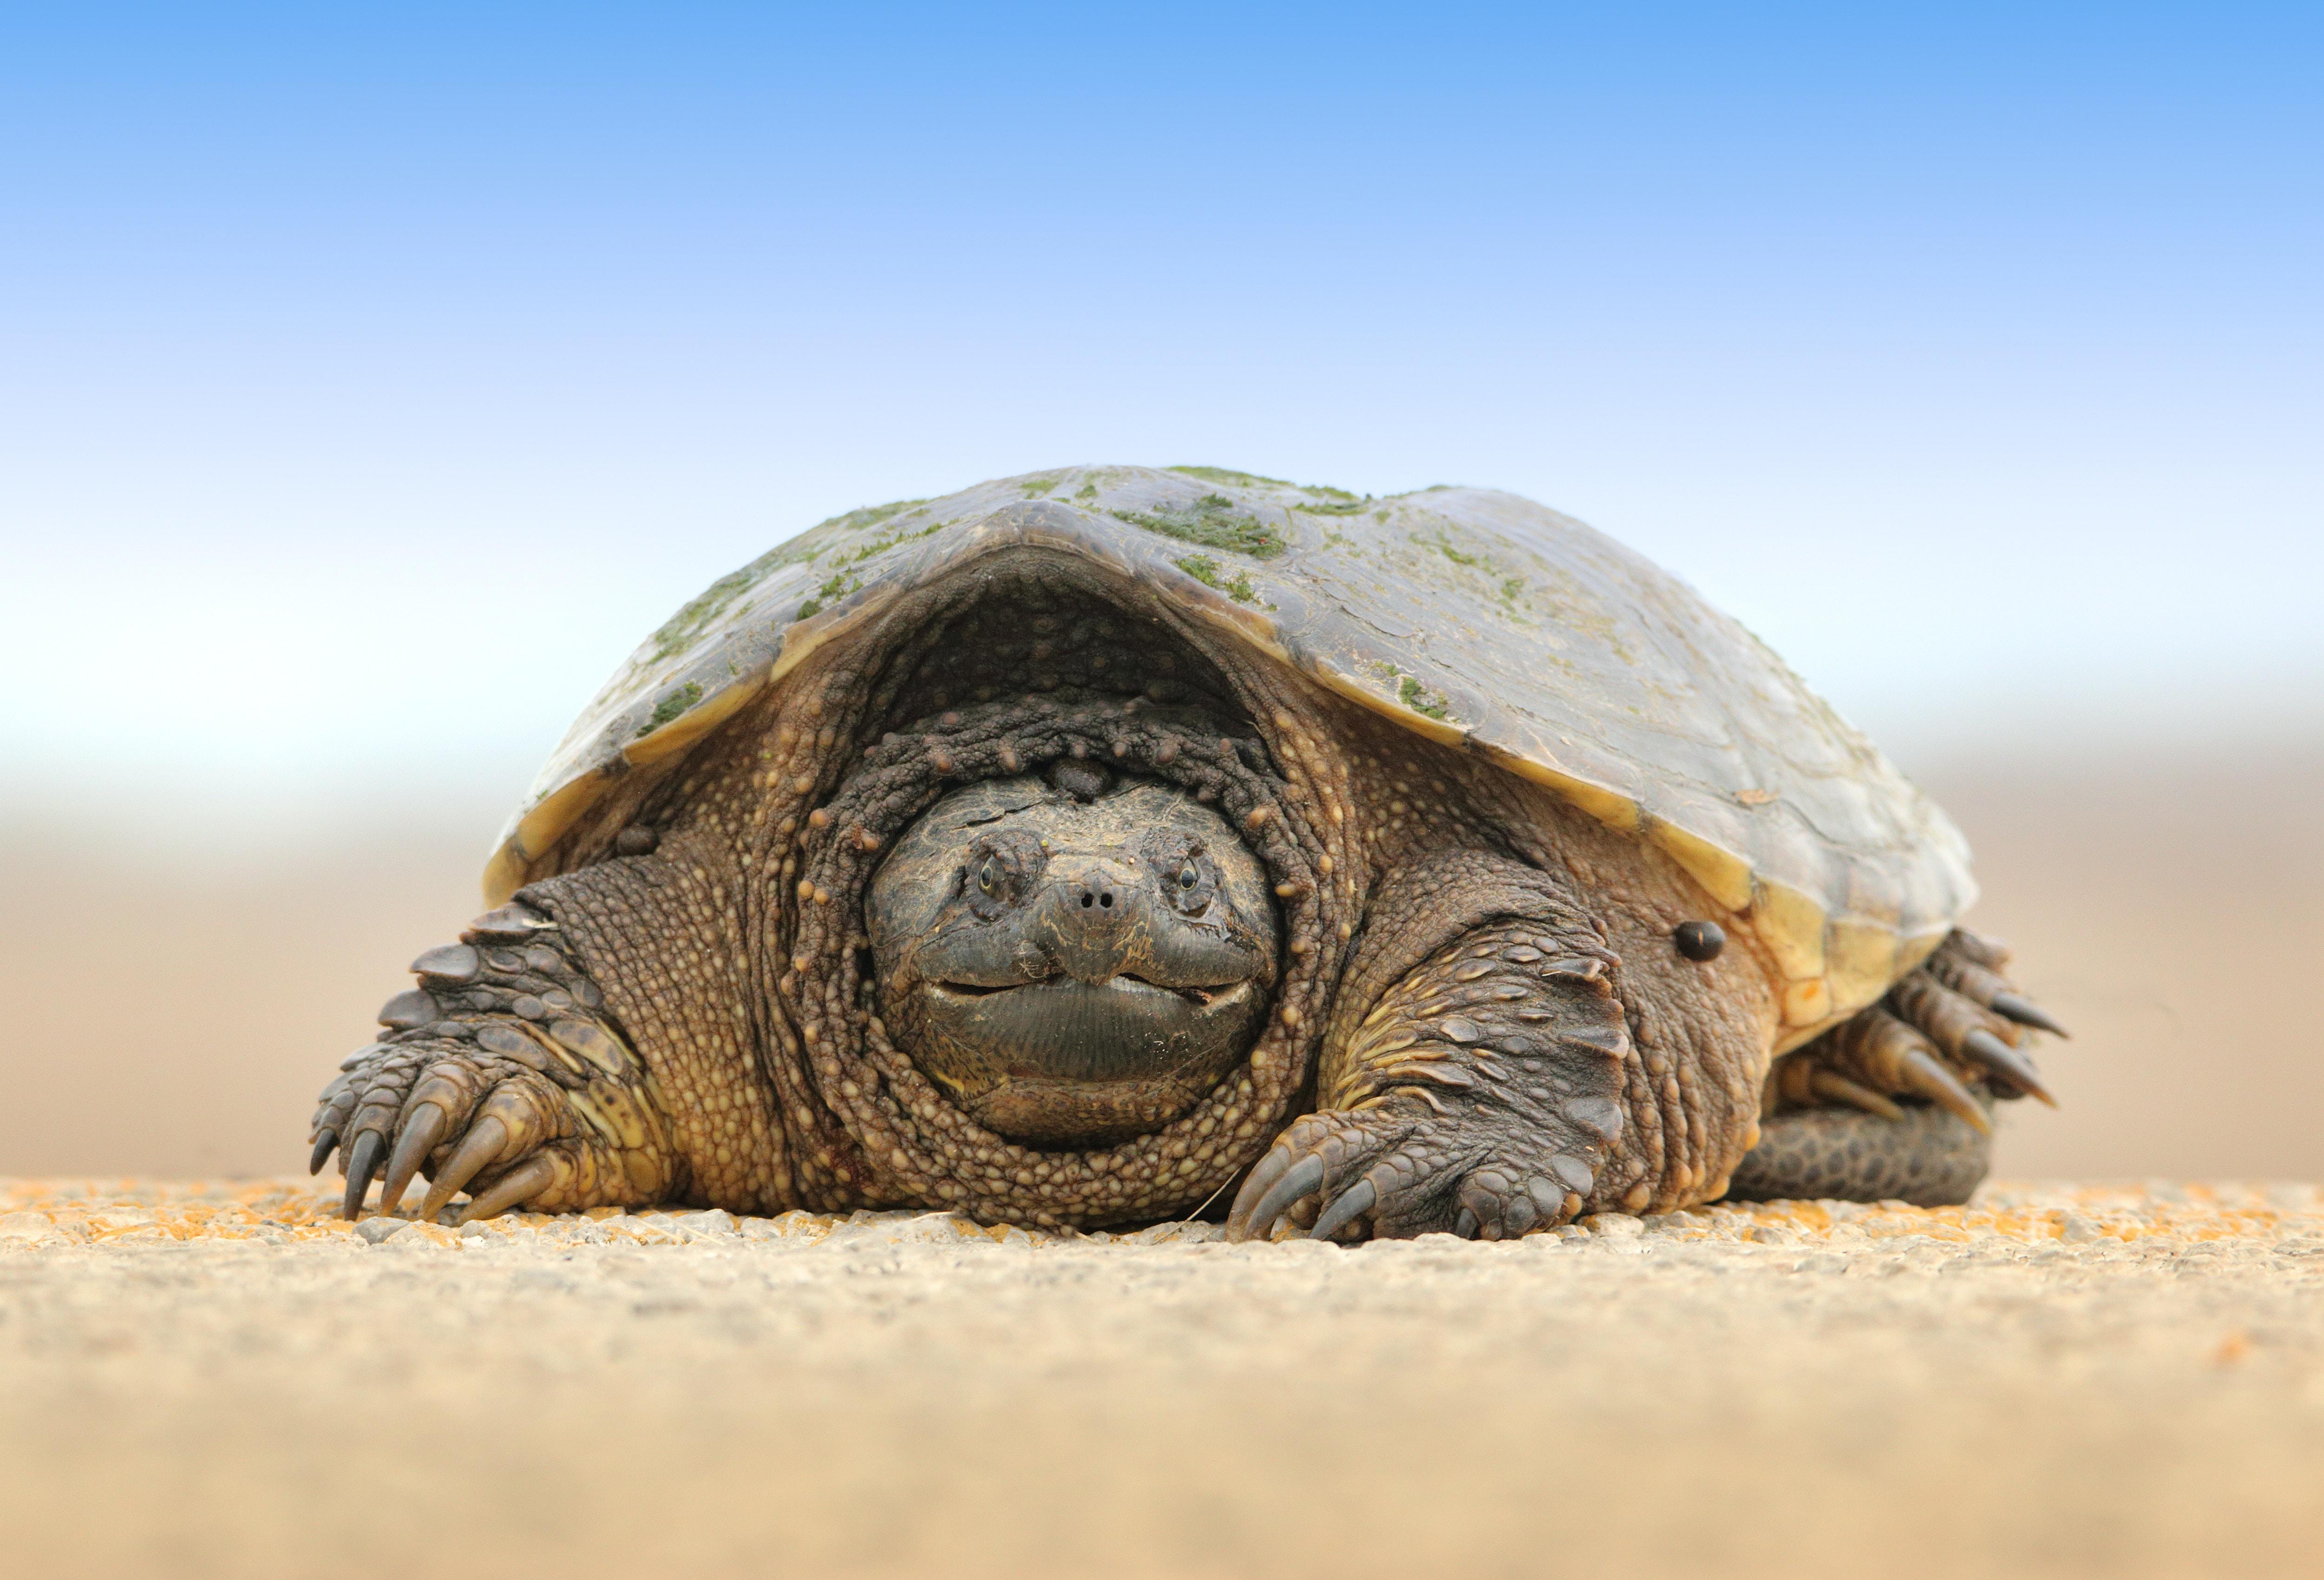 Tortoise on sandy ground in the Magee Marsh Wildlife Area